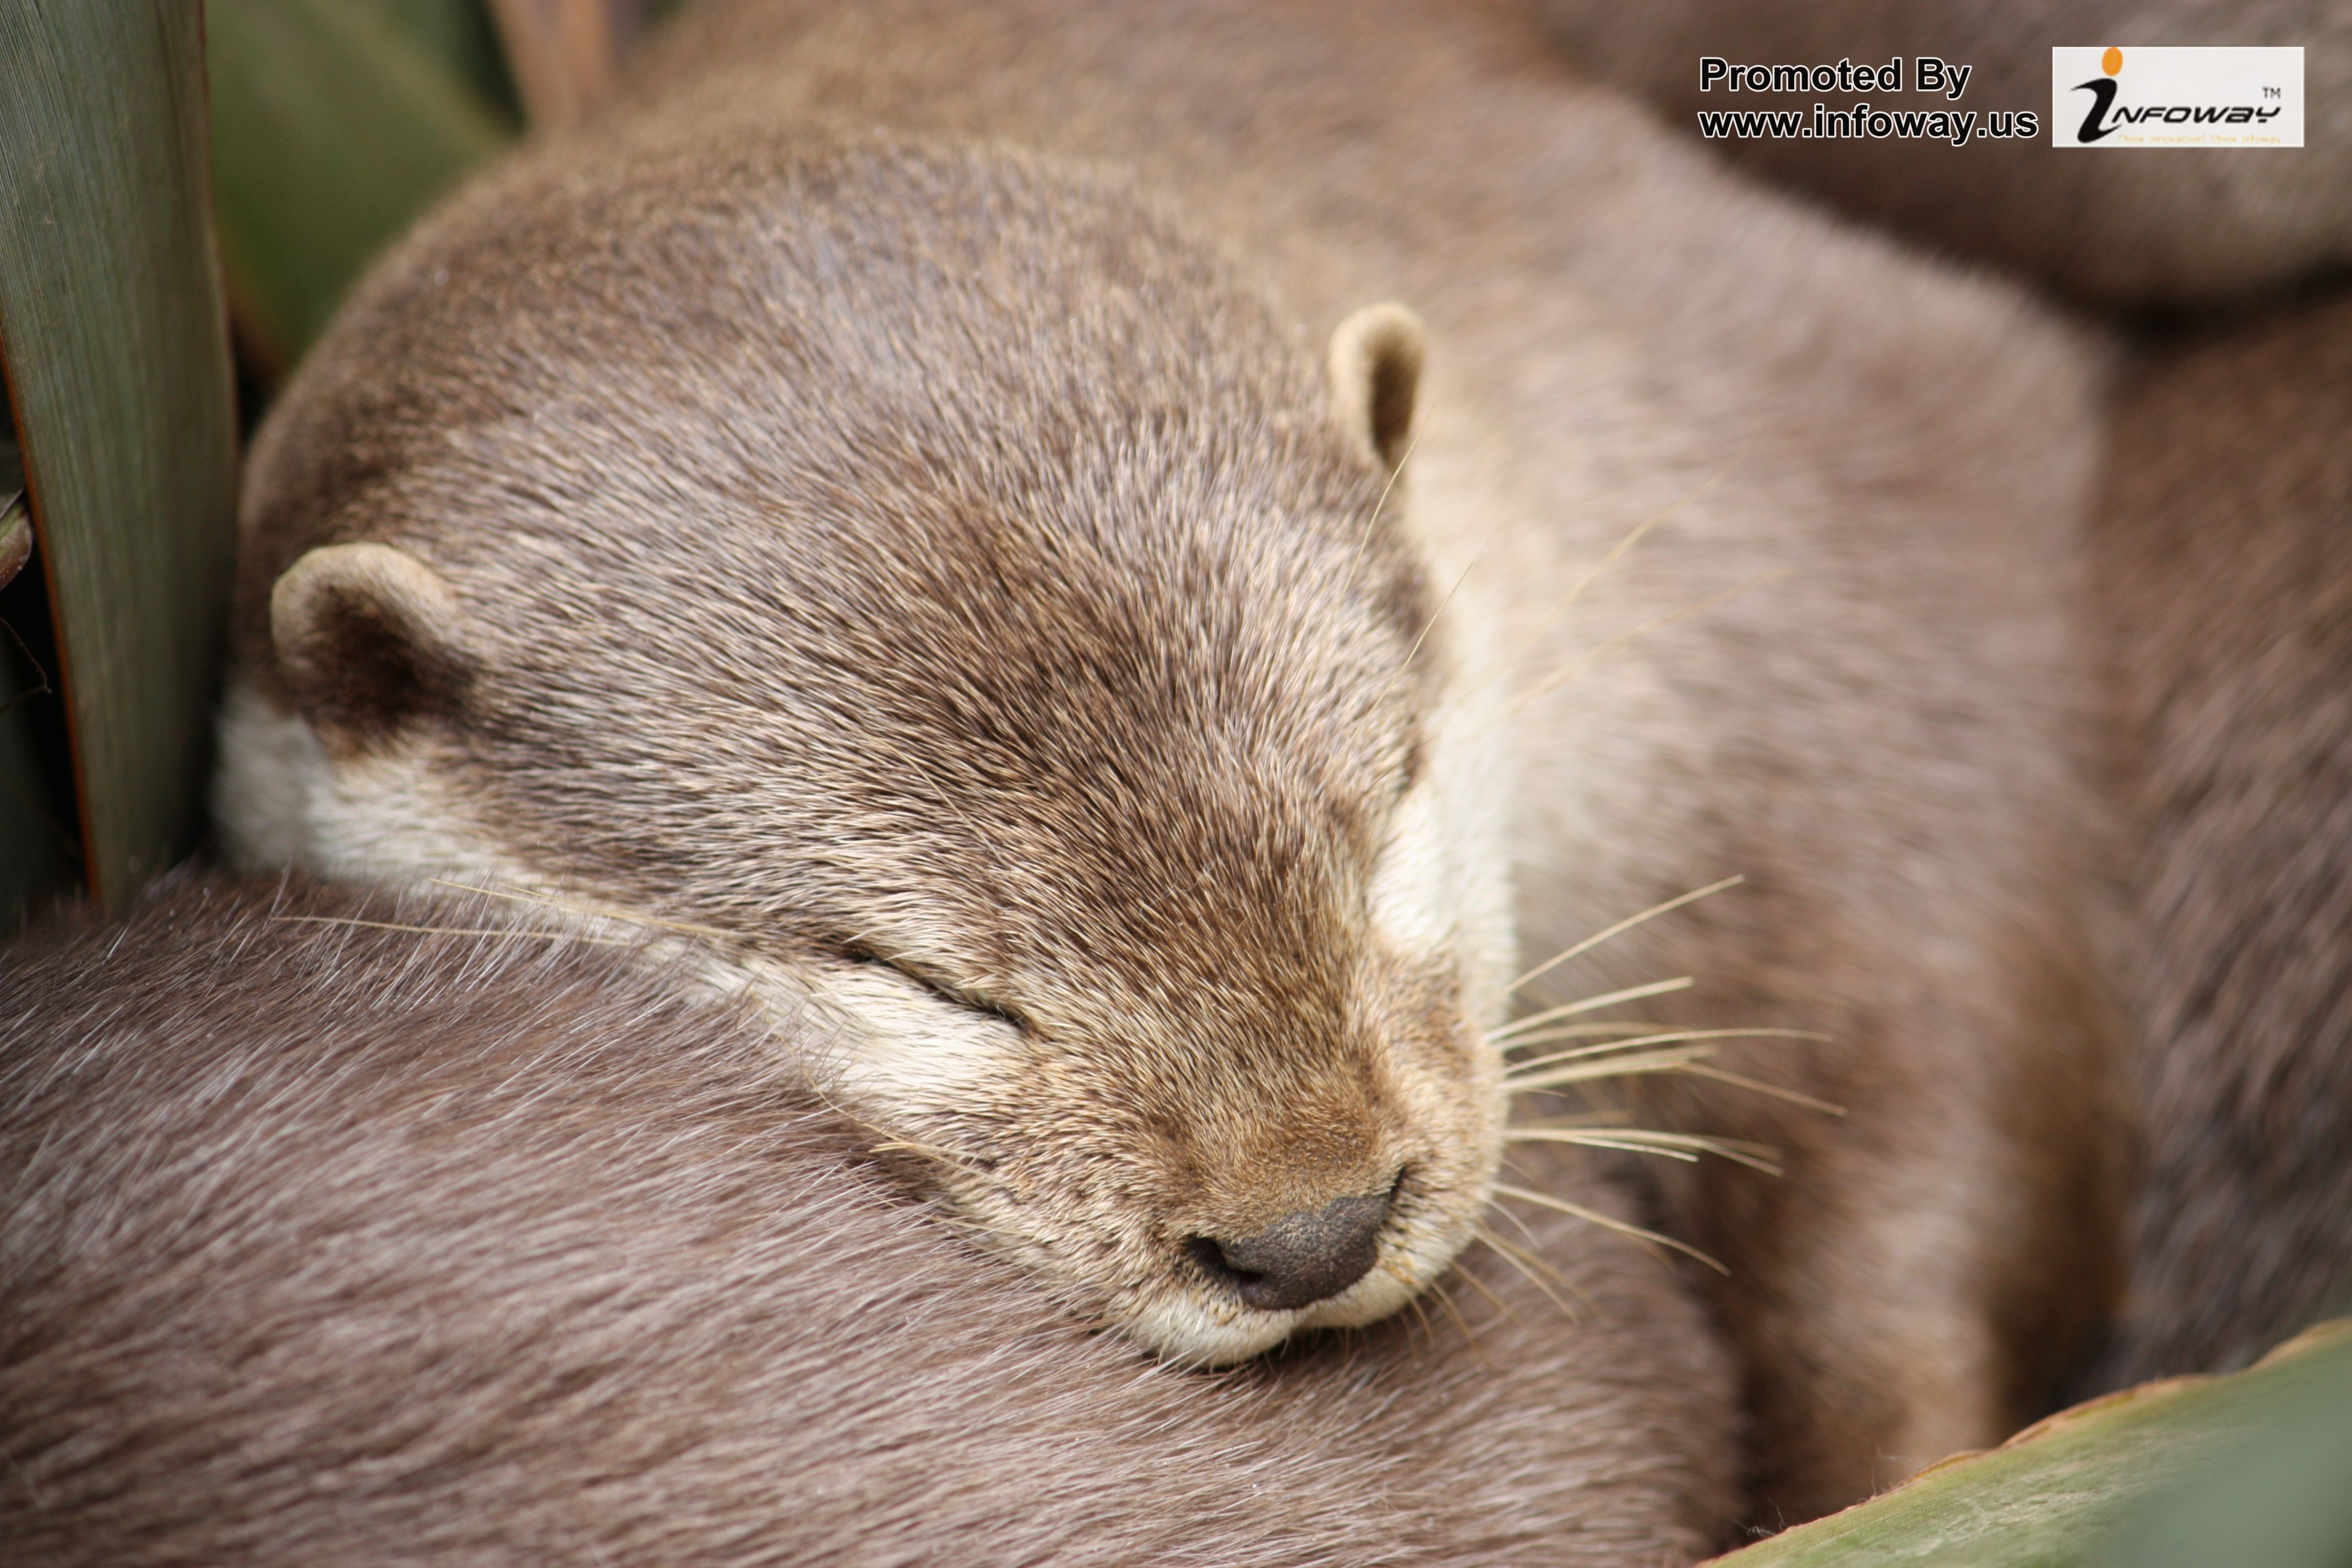 Cute Otters Wallpaper Hd   Photo 27 of 217 phombocom 4272x2848